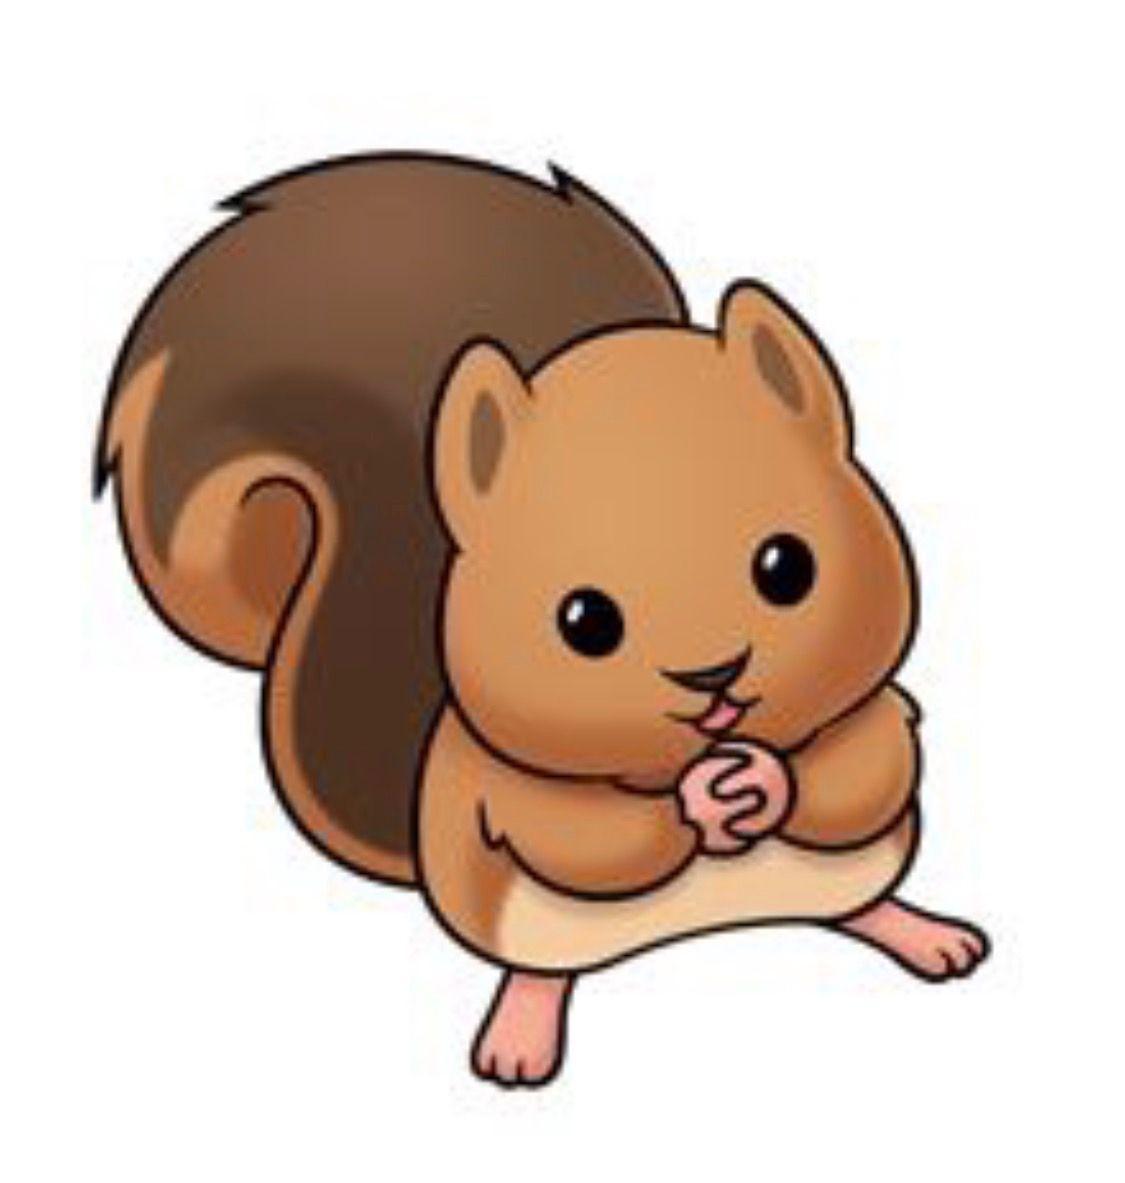 baby chipmunk squirrels cute